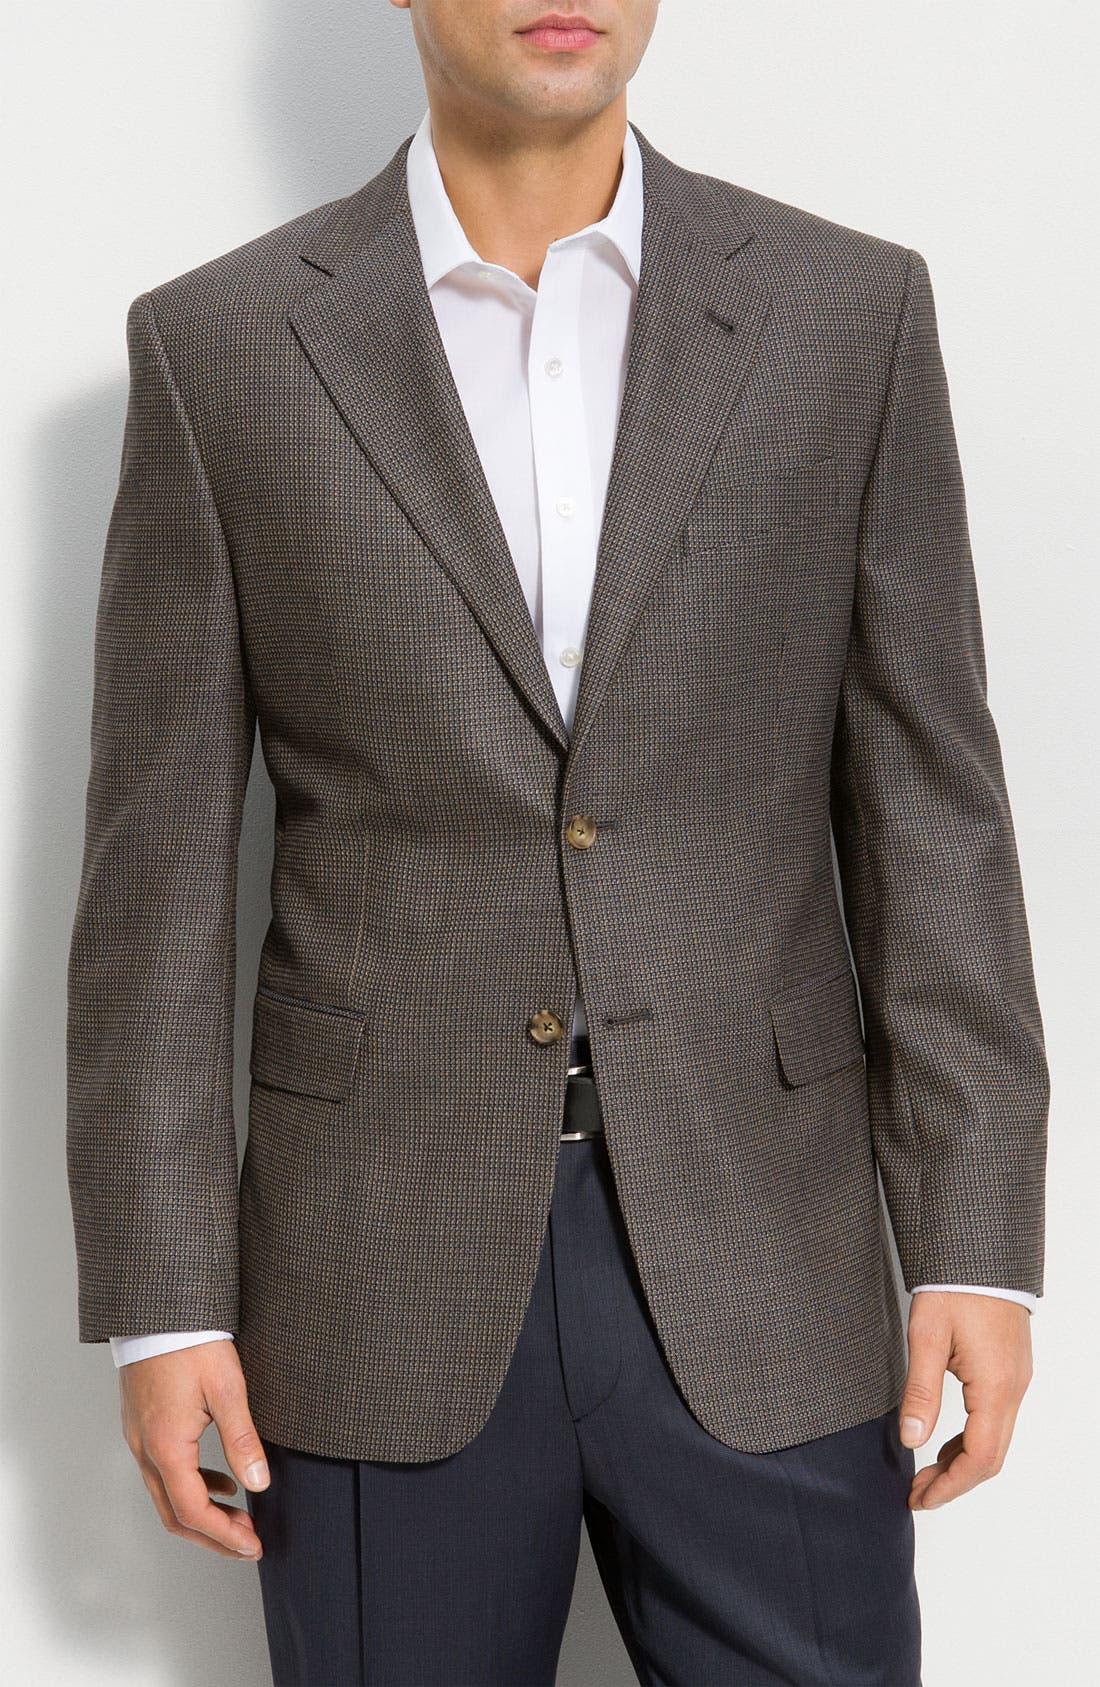 Main Image - Joseph Abboud 'Profile' Sportcoat